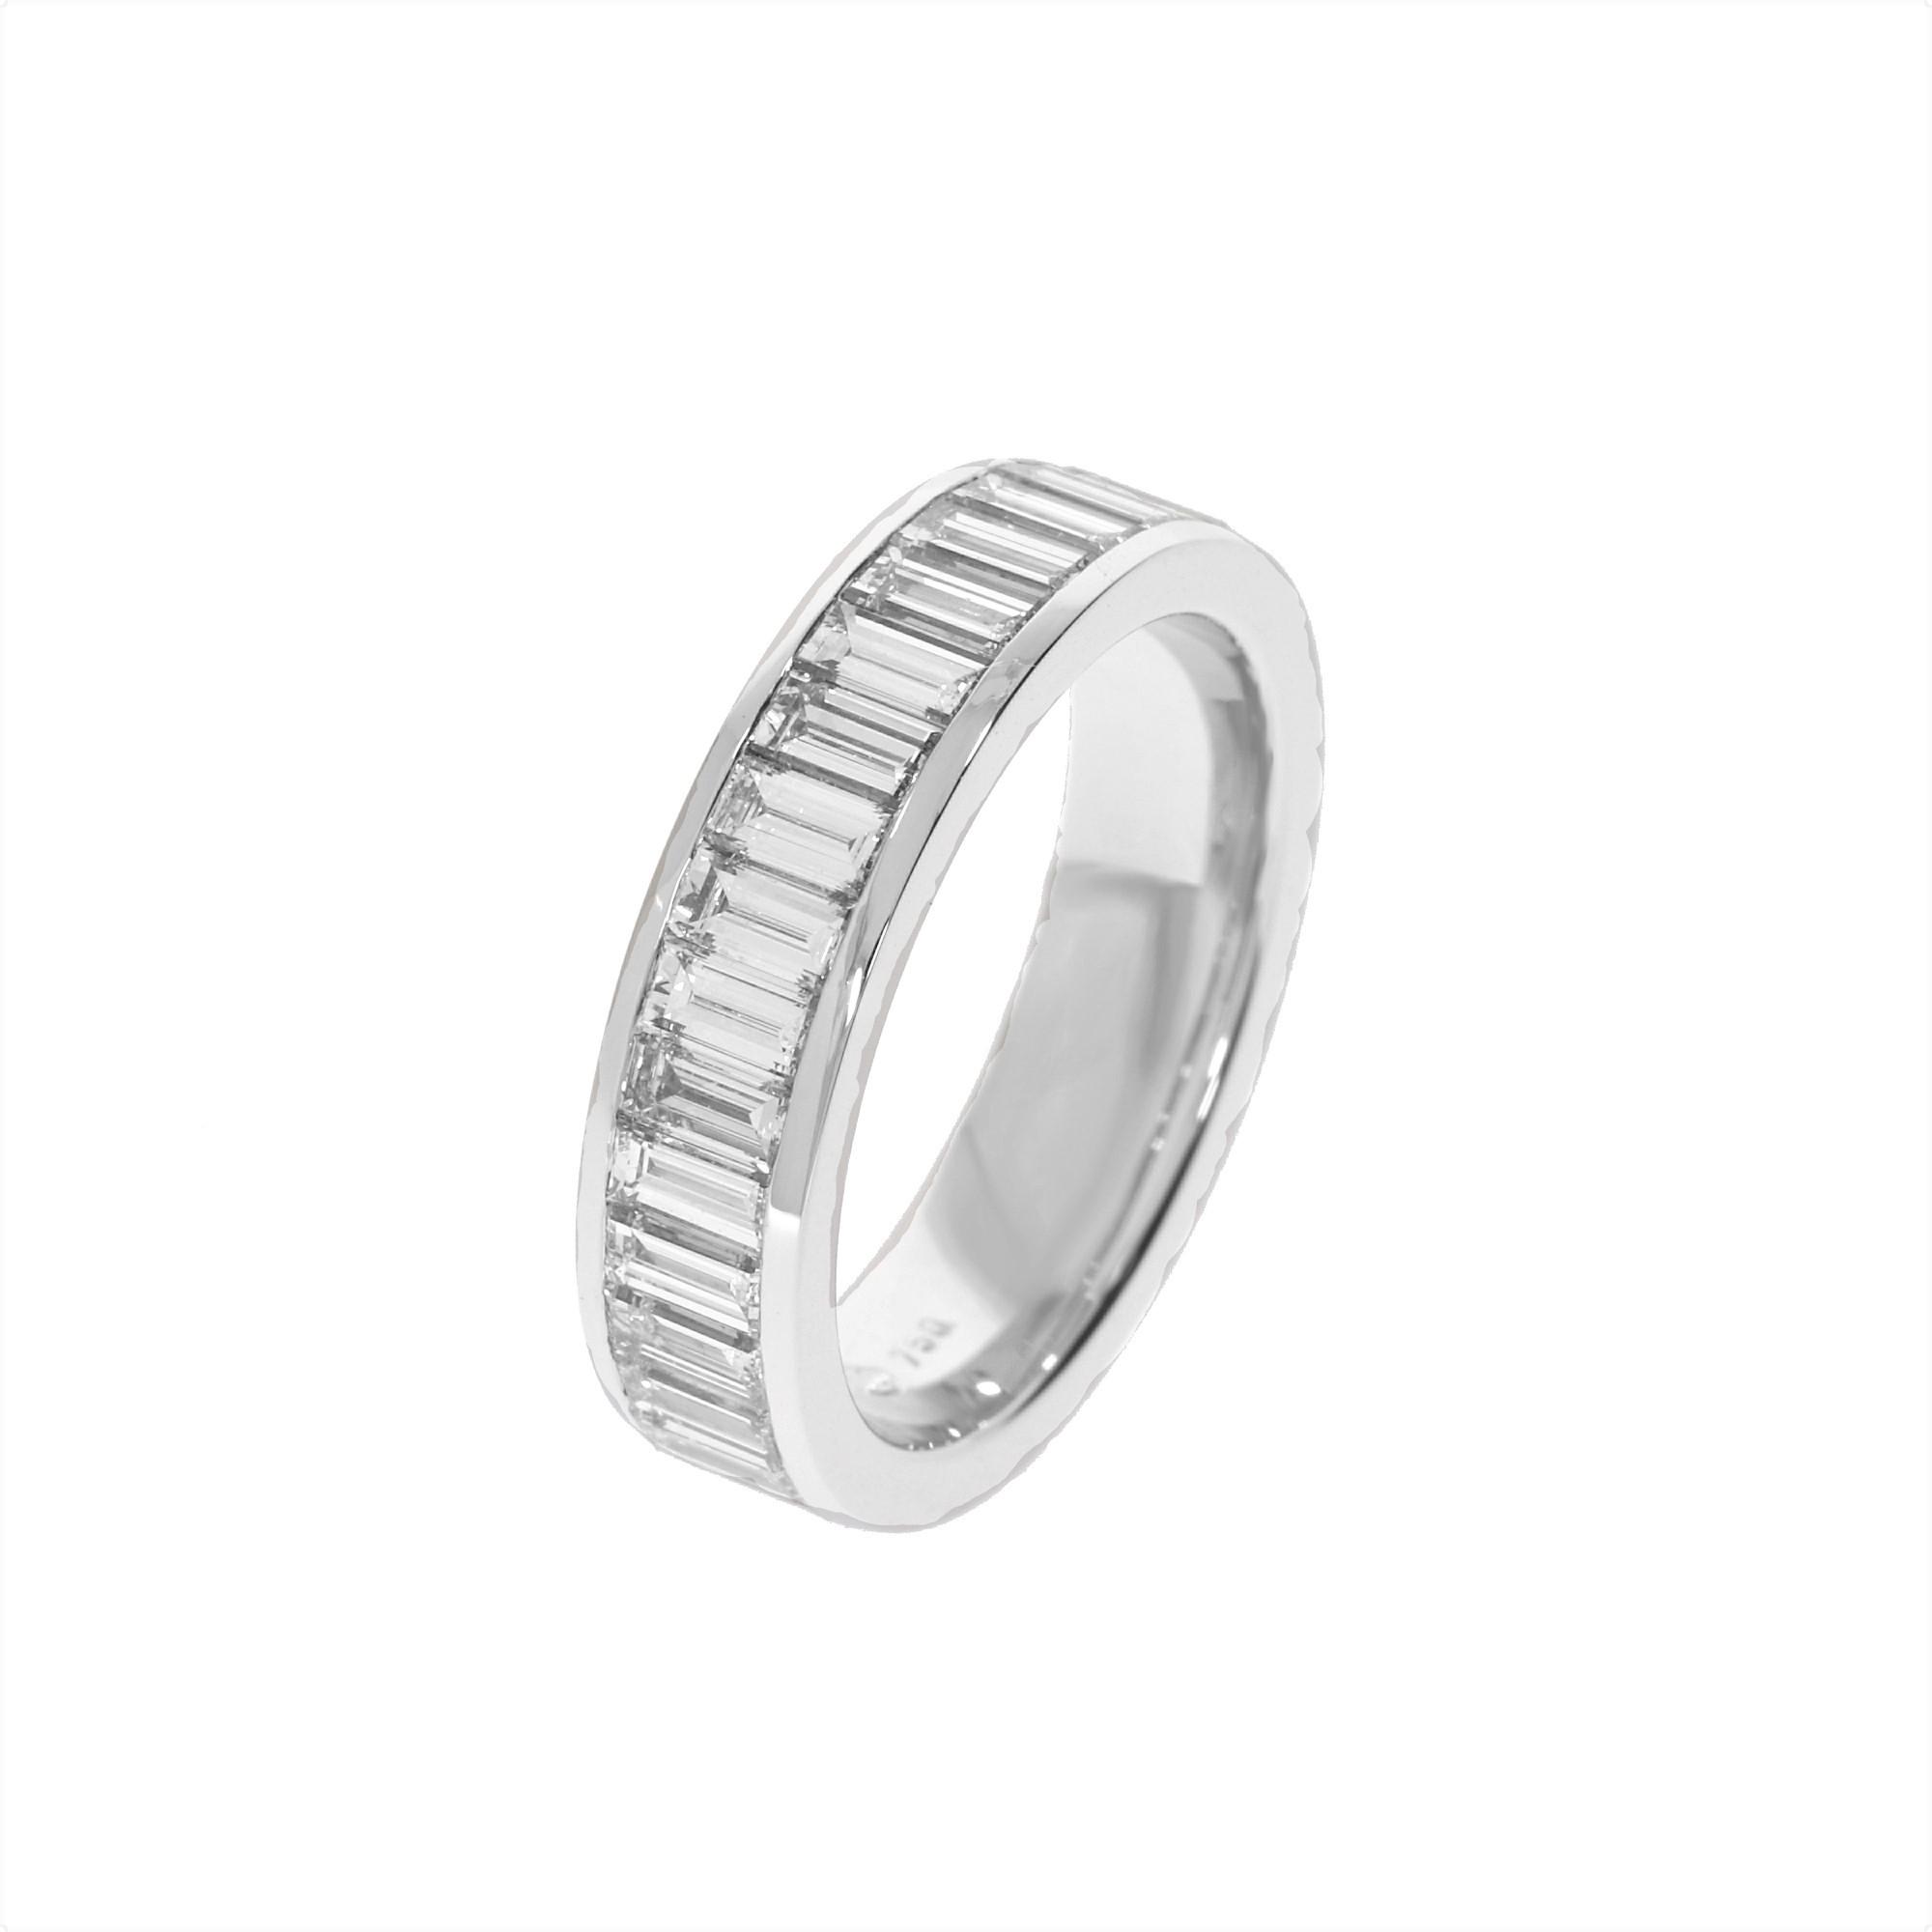 memoire-ring-weißgold-18k-baguette-diamanten